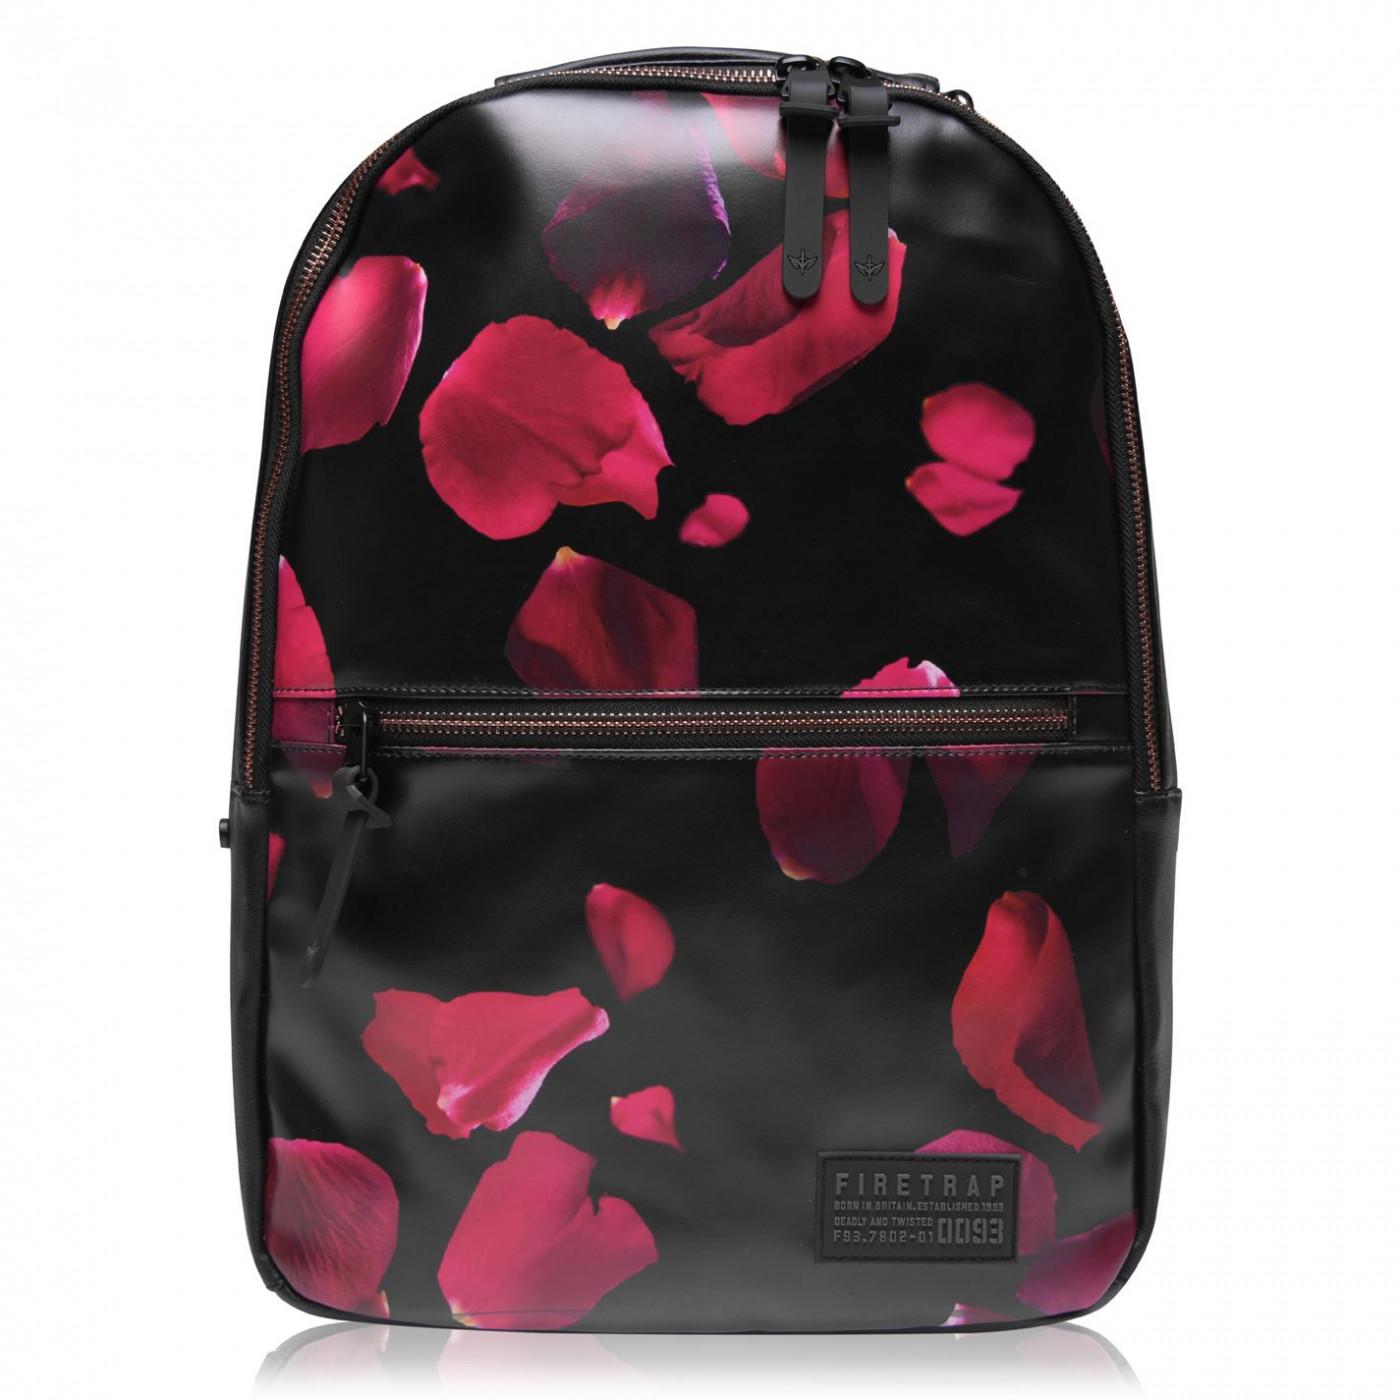 Firetrap Luxe Backpack